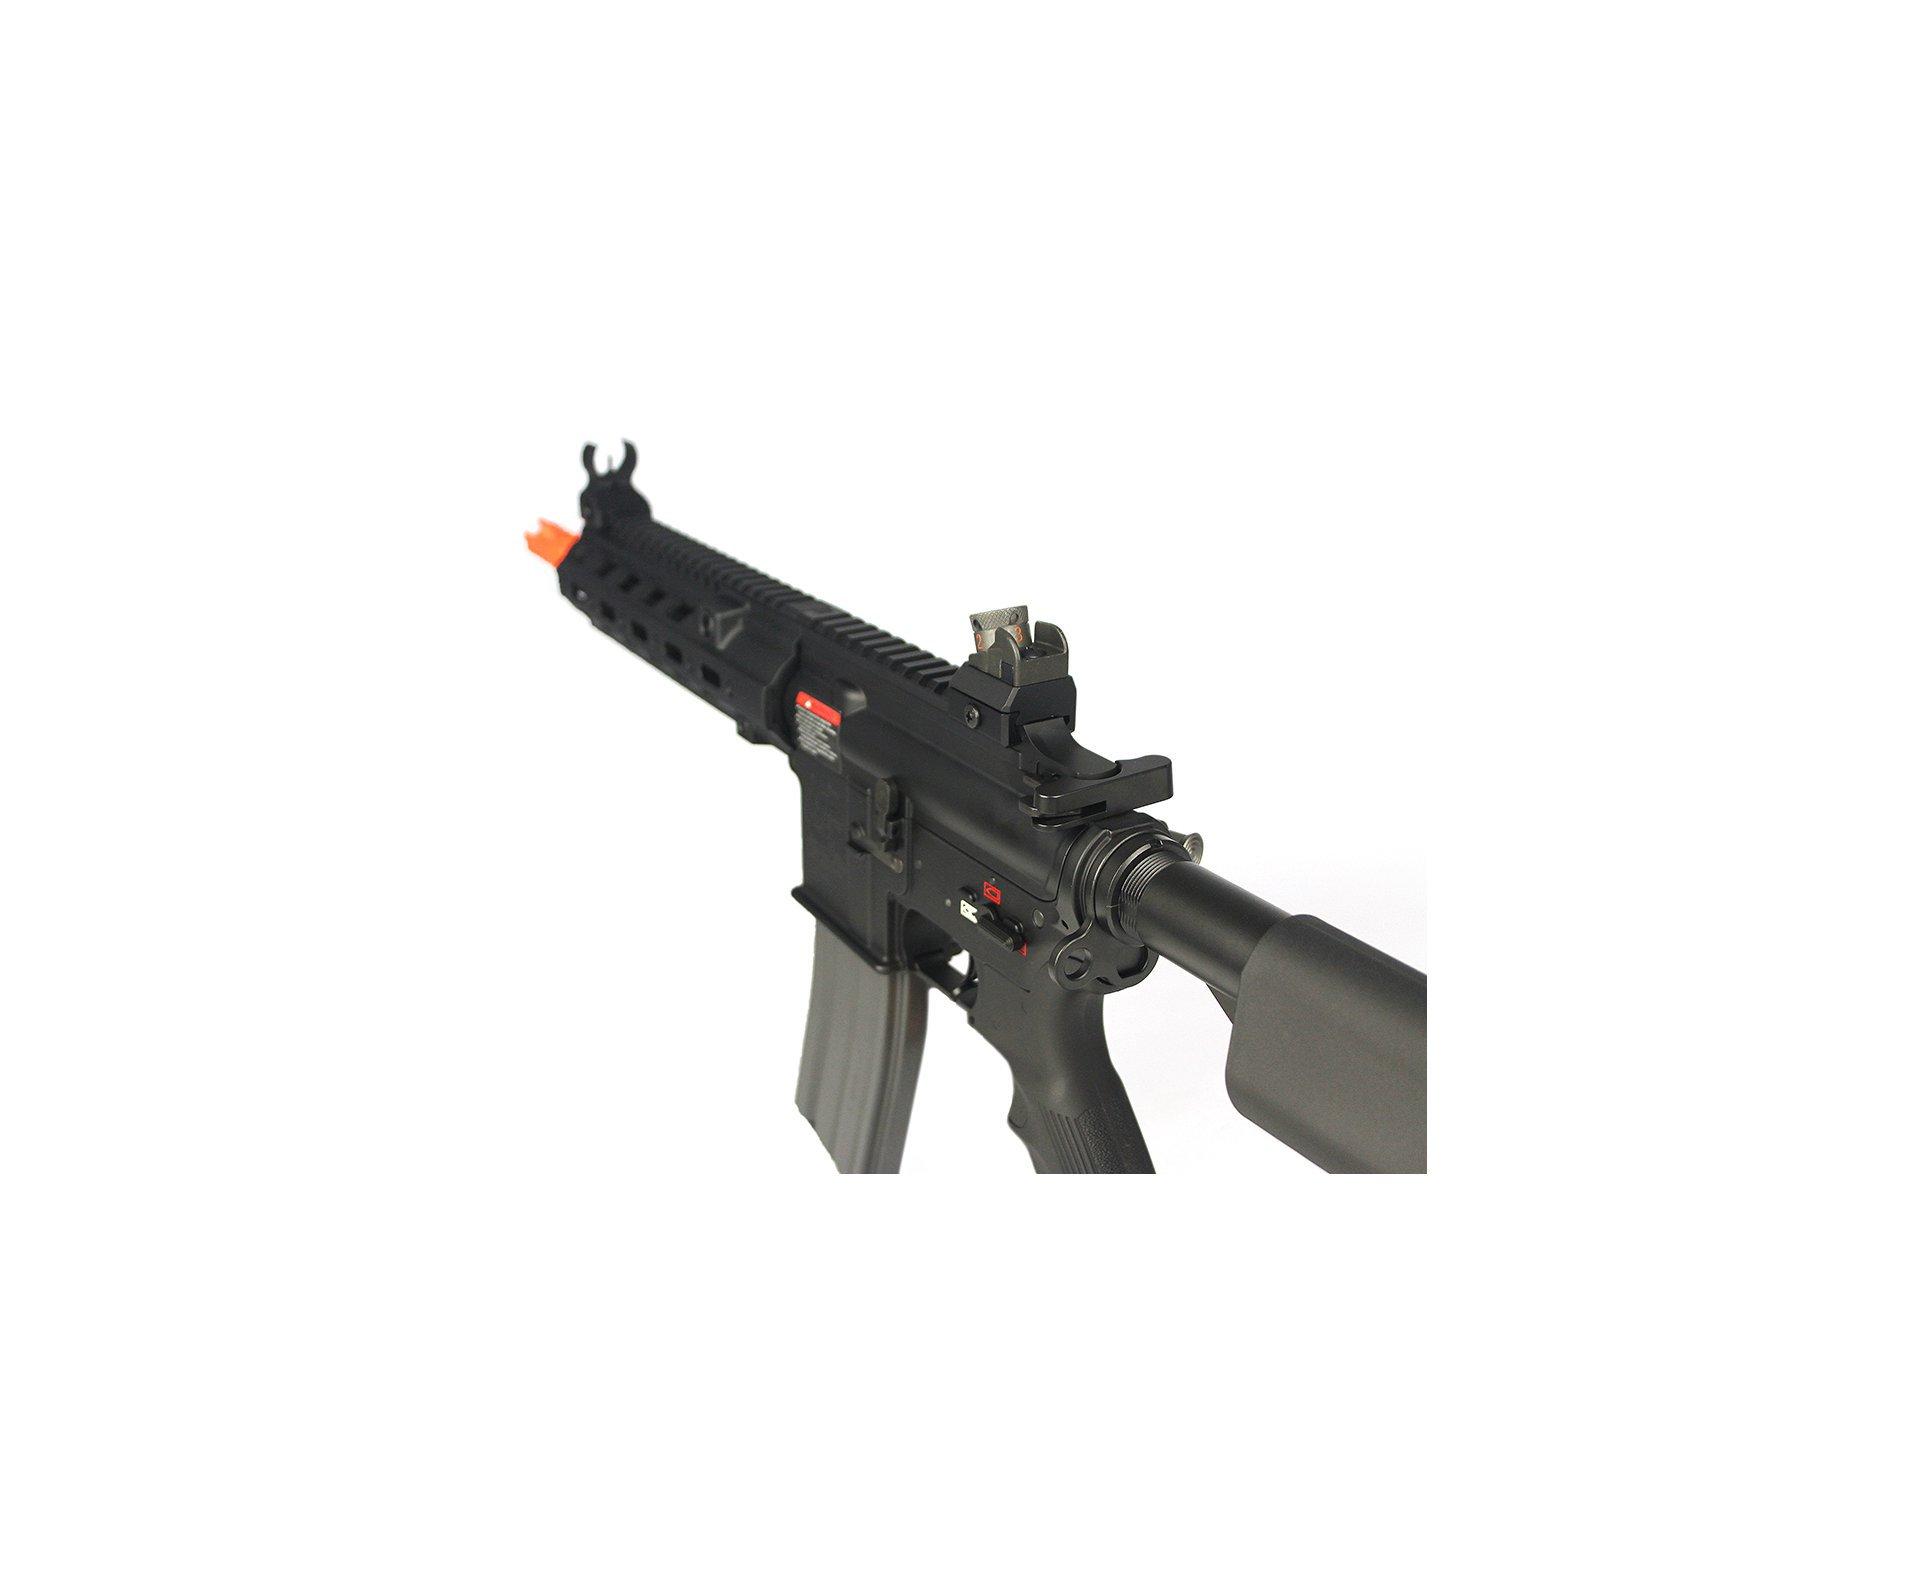 Rifle De Airsoft M4 Cqb Blowback Gc1-46 Full Metal - G&g